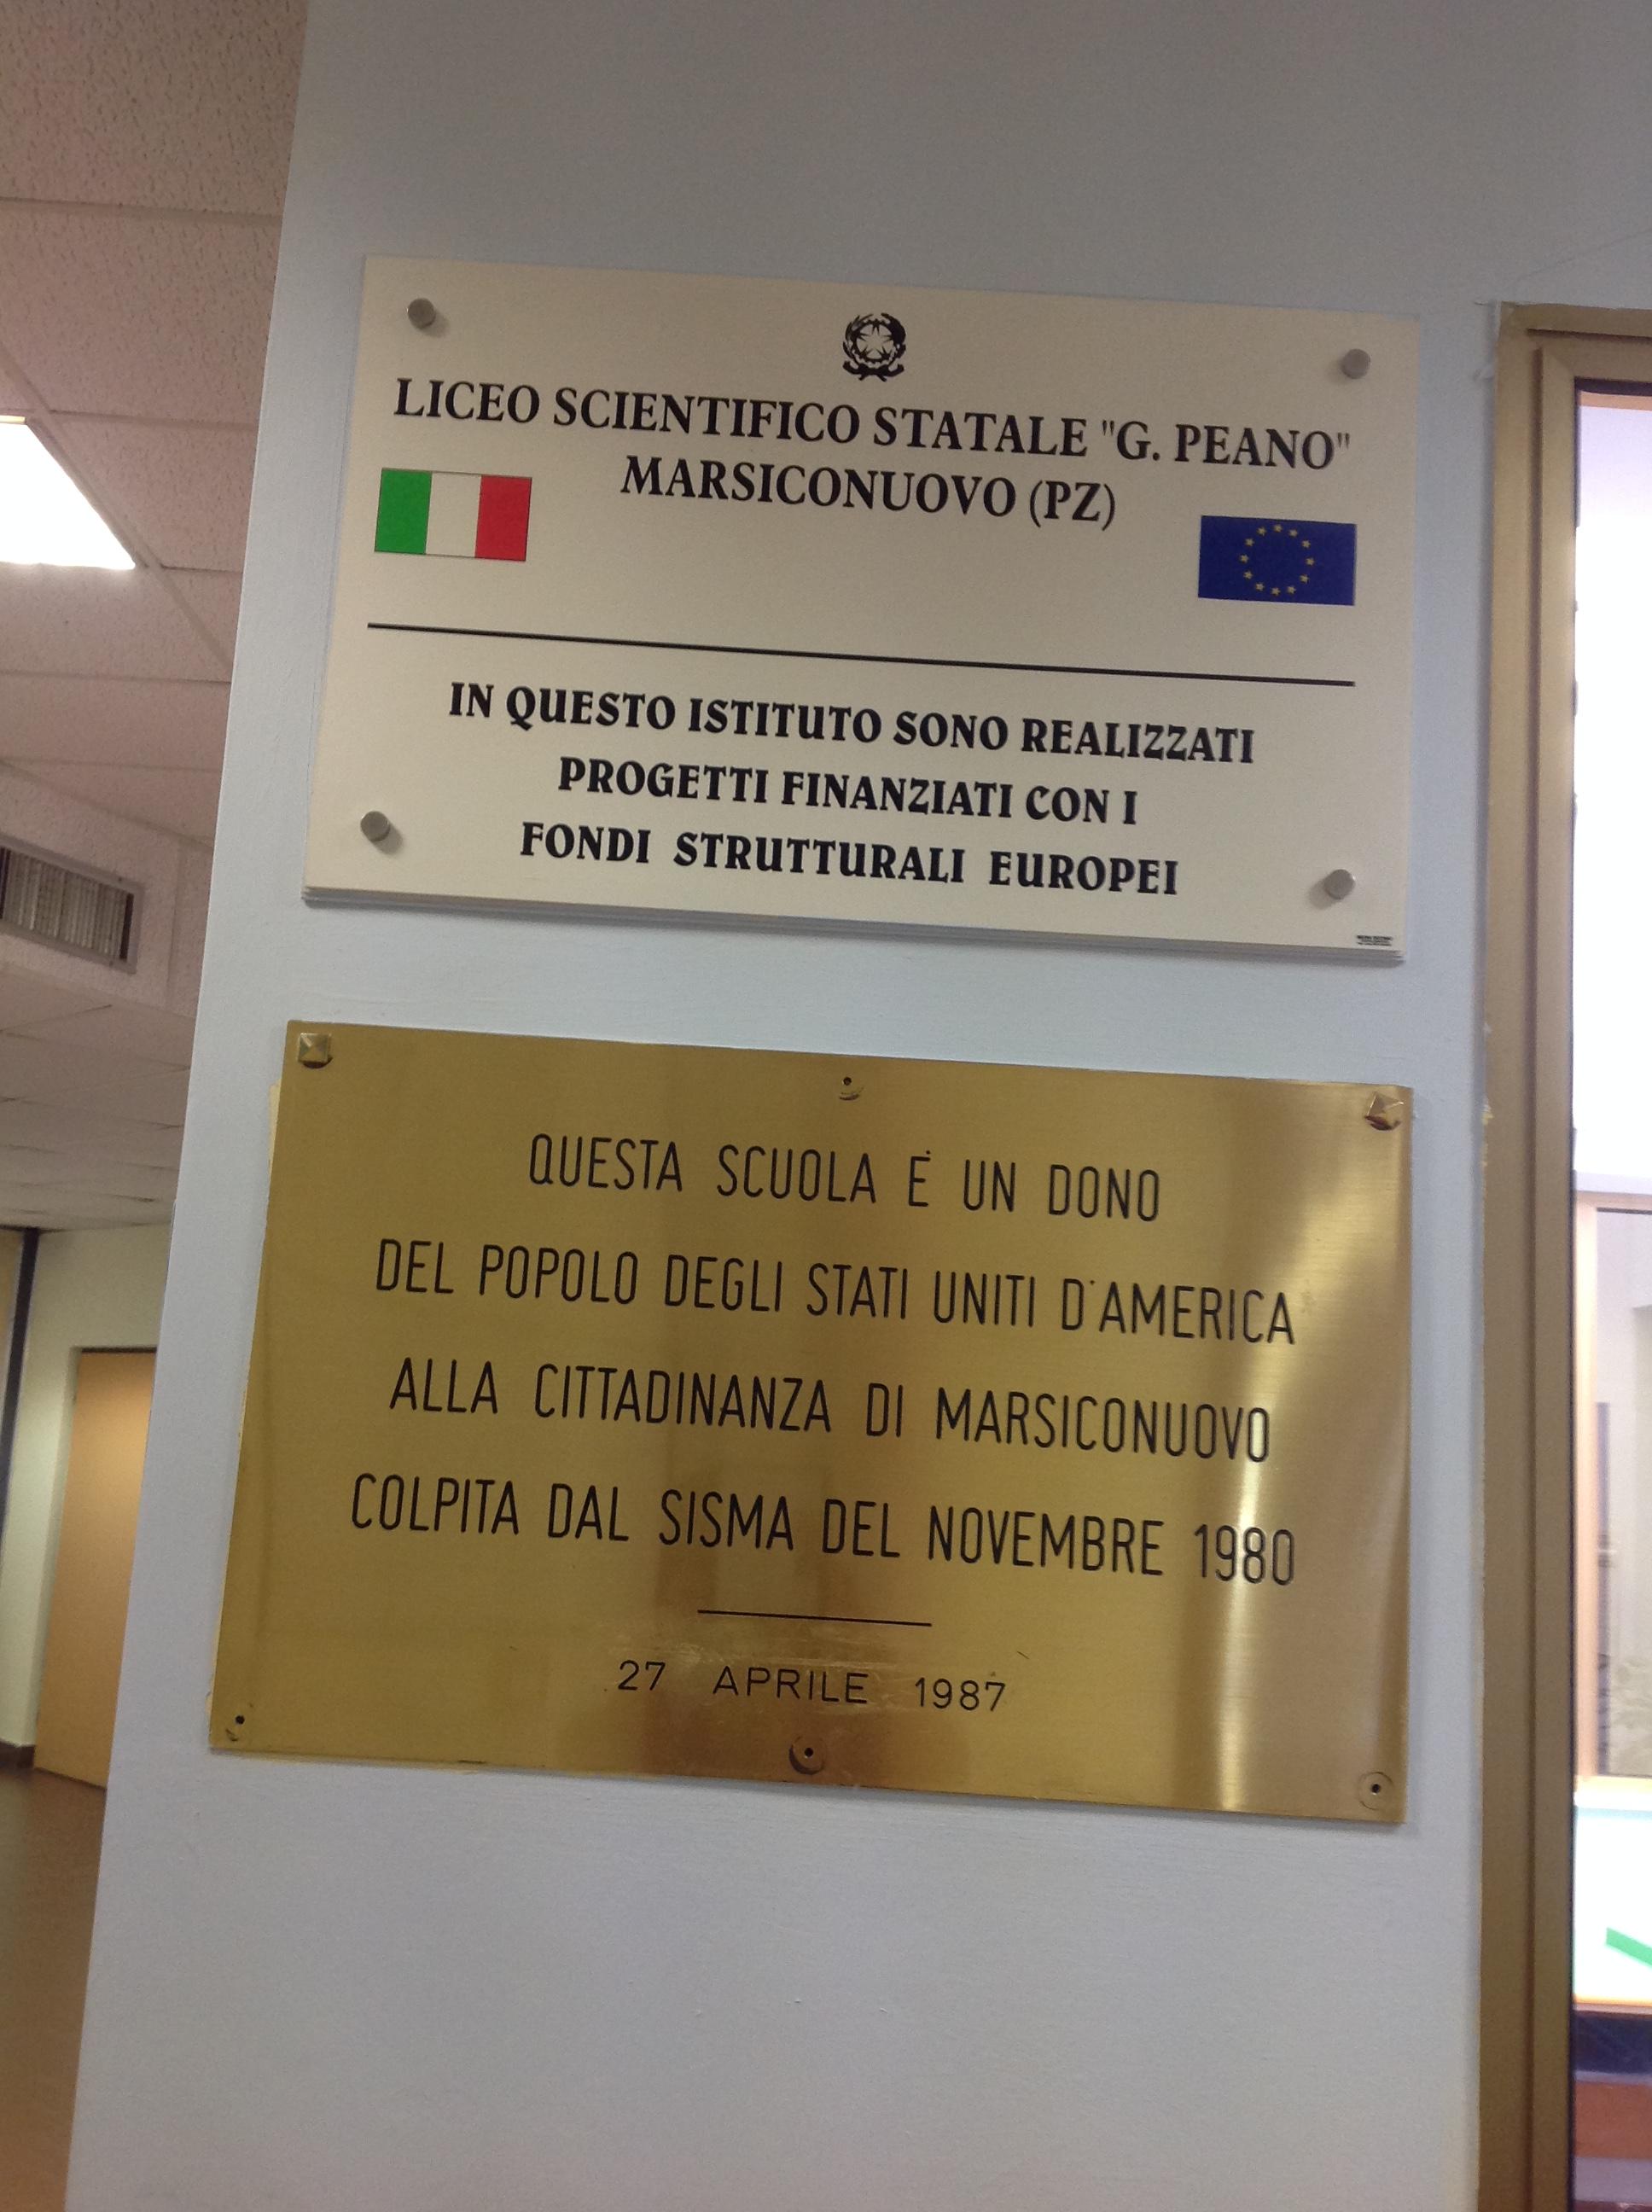 POTENZA-Liceo